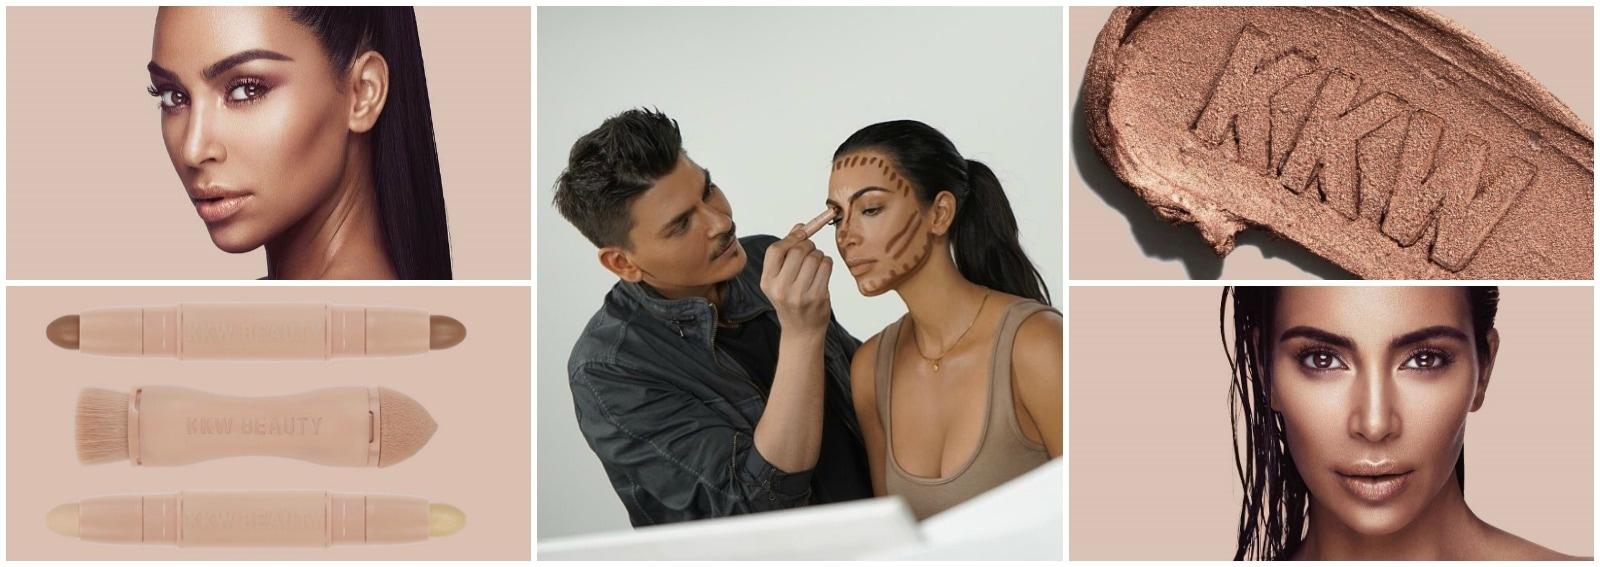 kkw-beauty-kim-kardashian-make-up-contouring-cover desktop 01